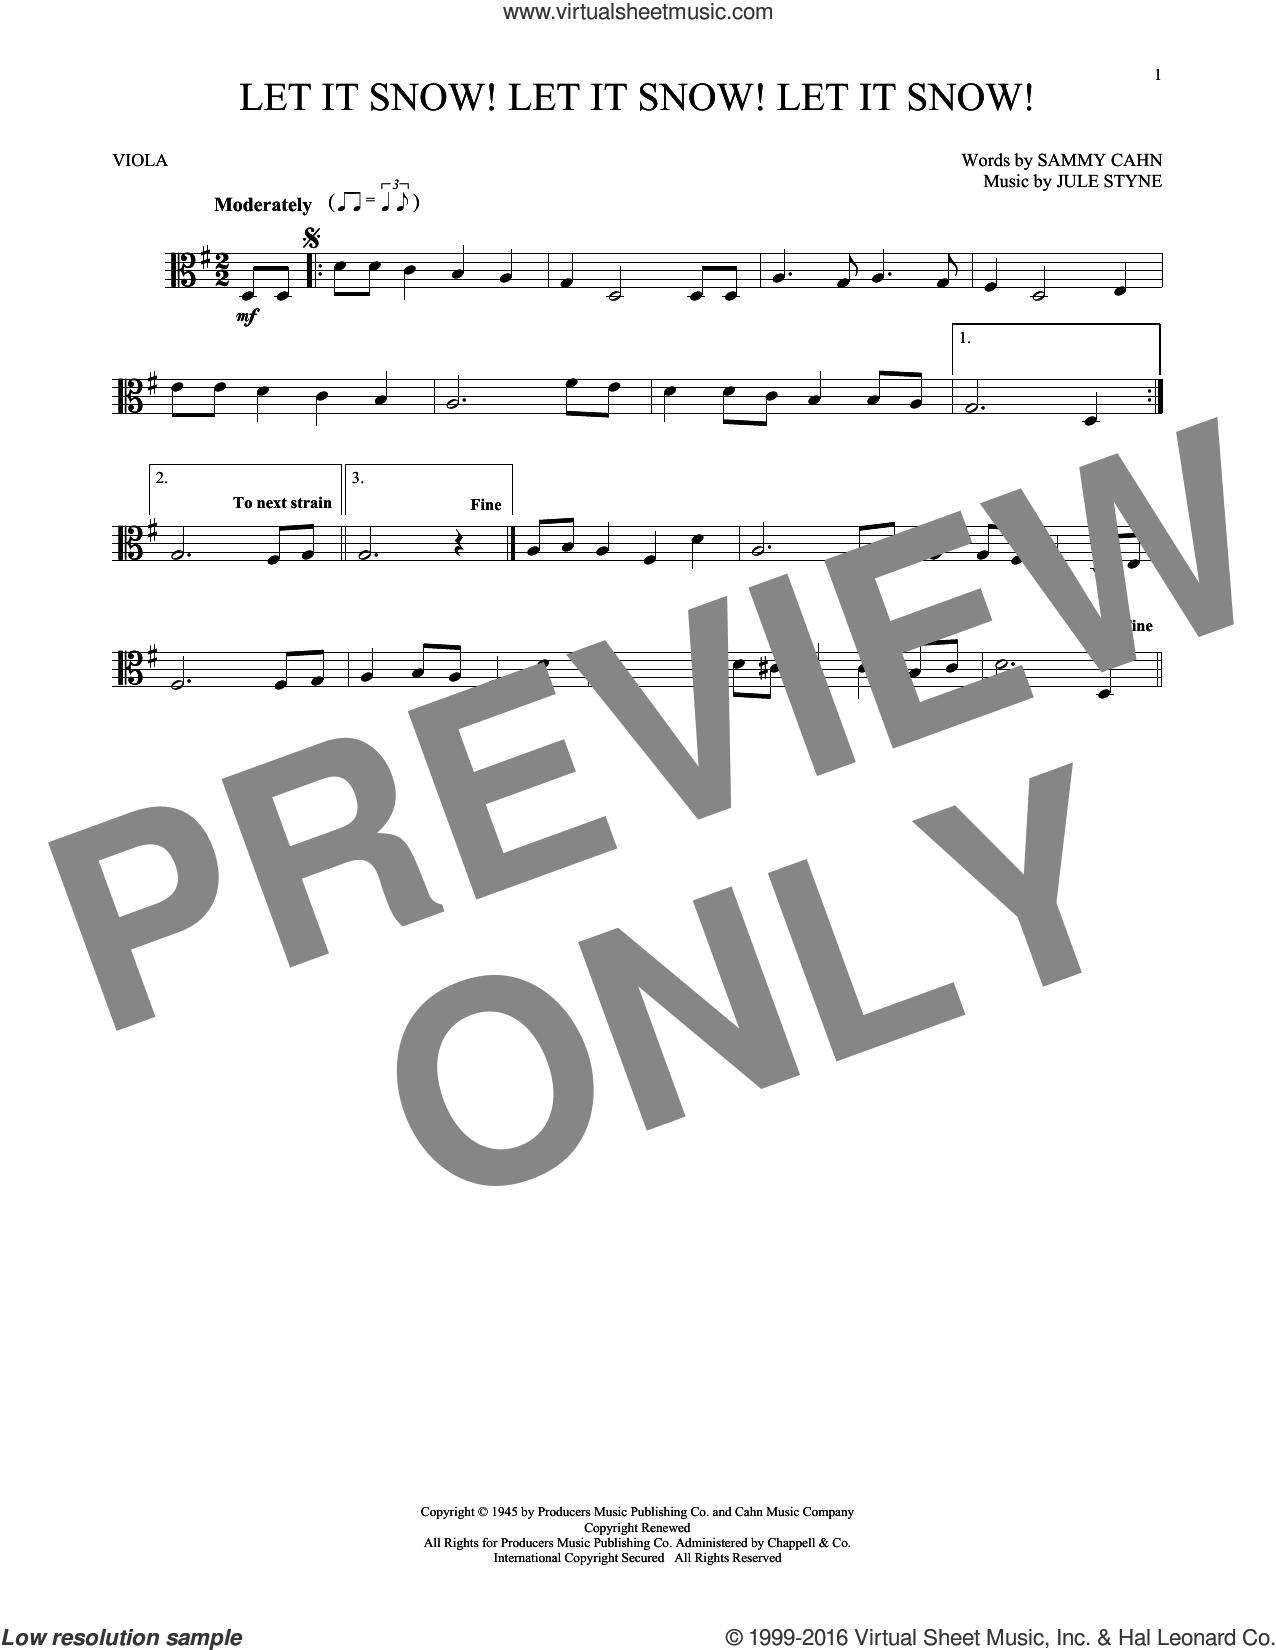 Let It Snow! Let It Snow! Let It Snow! sheet music for viola solo by Sammy Cahn, Jule Styne and Sammy Cahn & Julie Styne, intermediate skill level